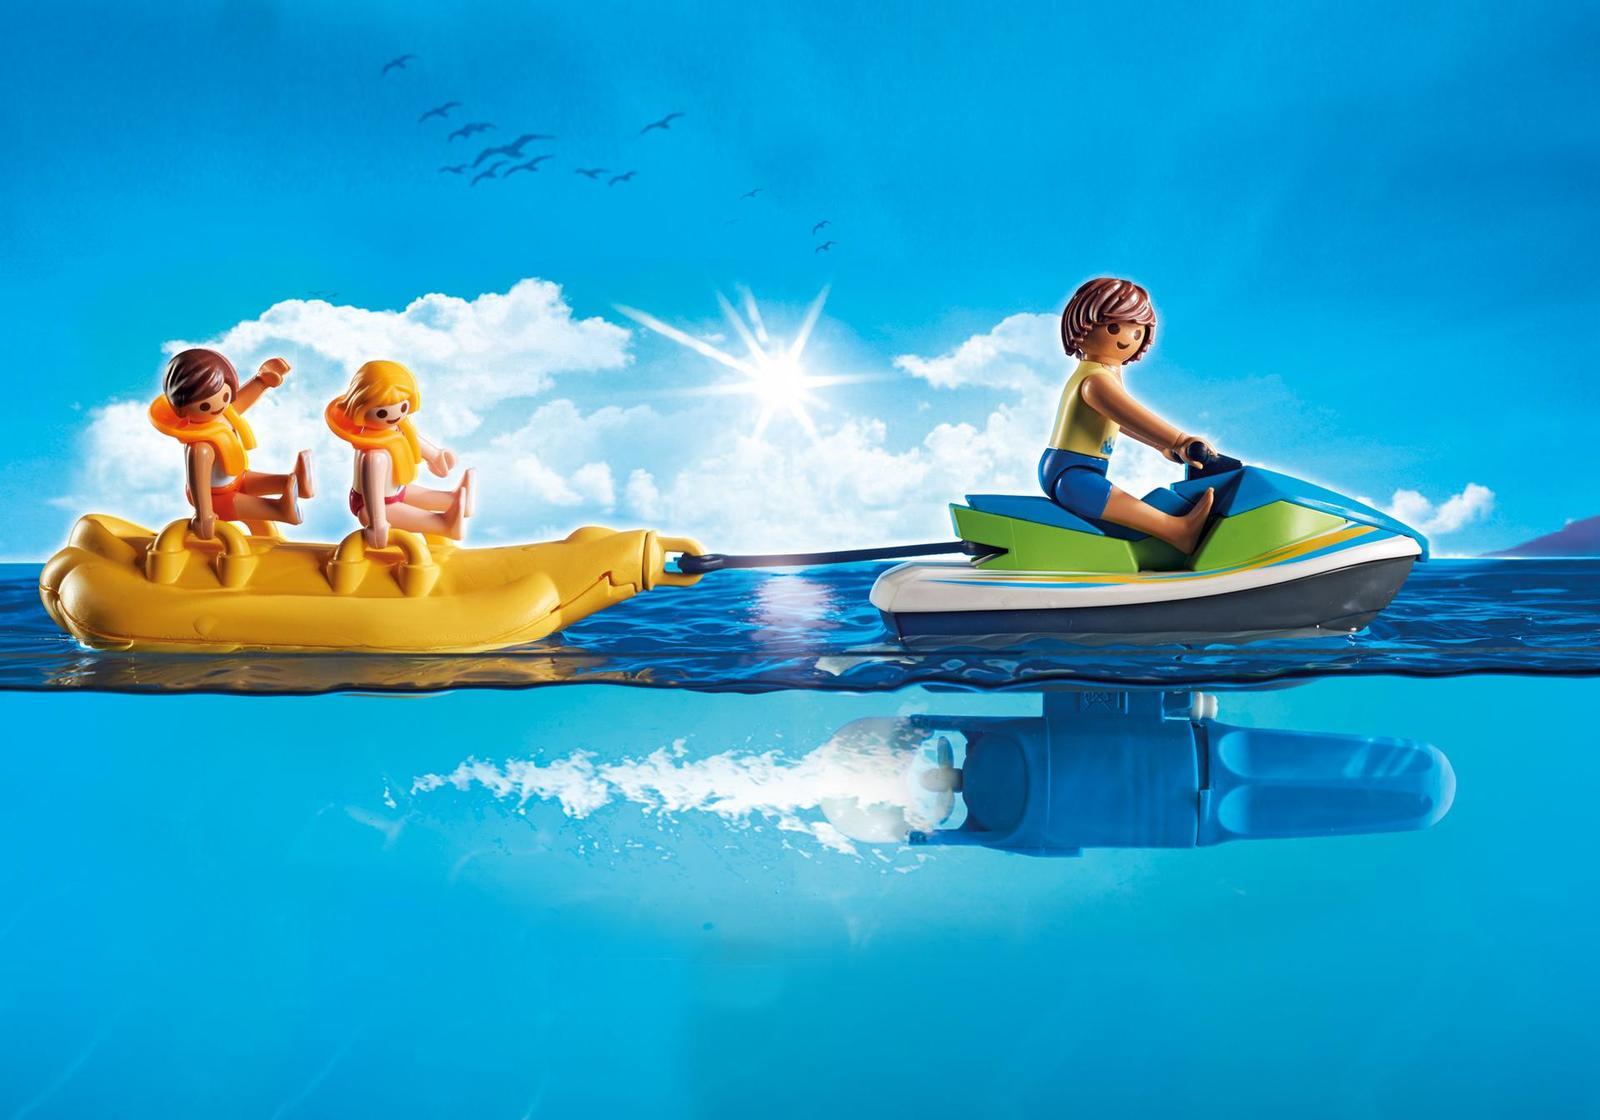 Playmobil: Family Fun - Watercraft with Banana Boat image